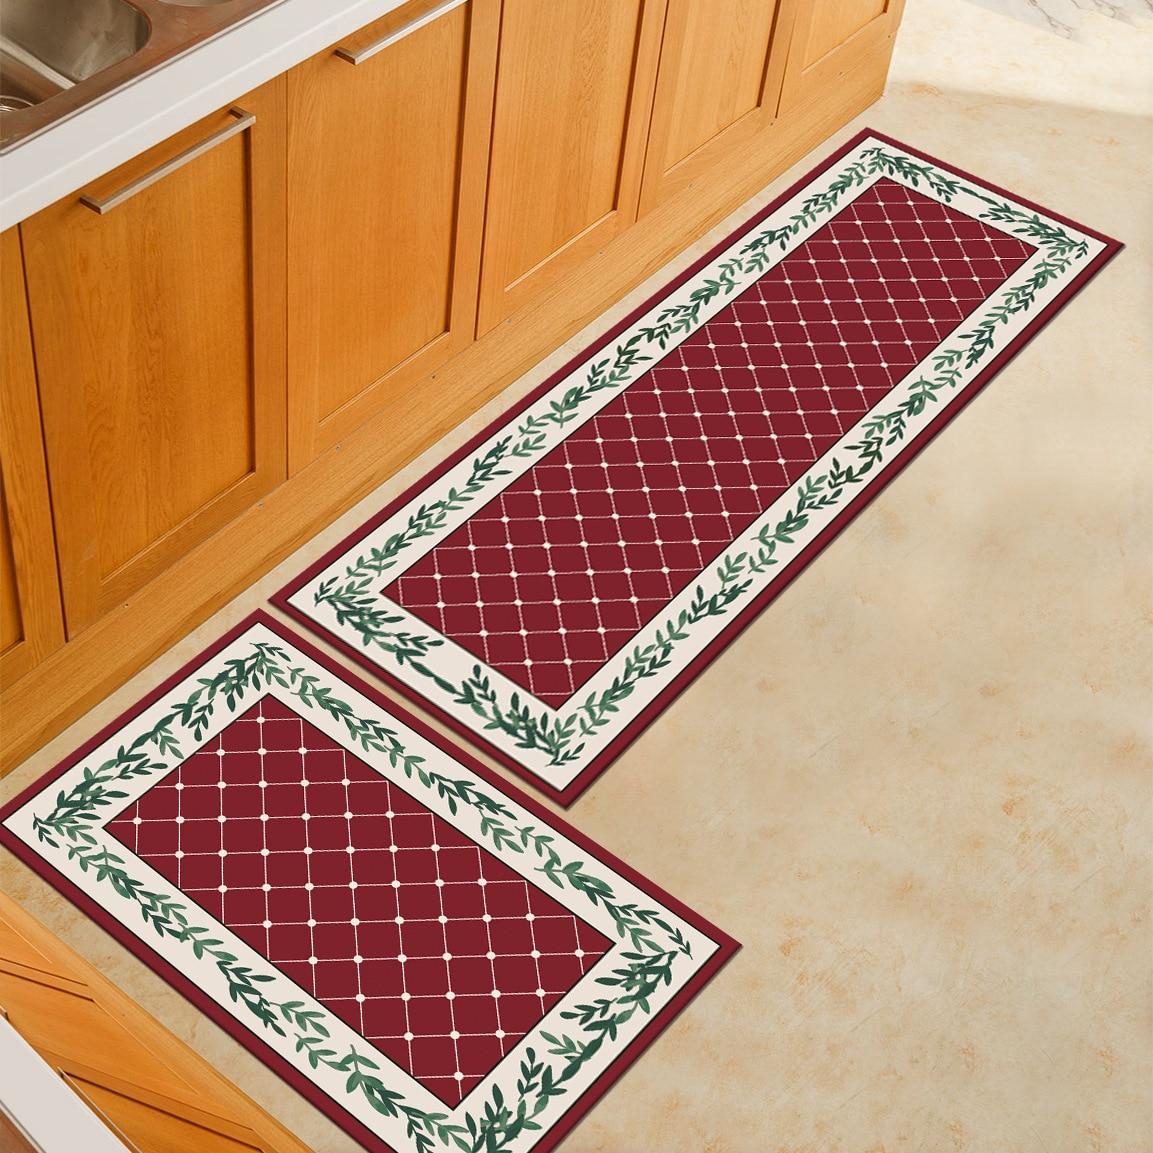 Tapete de cozinha antiderrapante tapete impresso moderno tapete de porta tapete tapete de cozinha tapete de cozinha